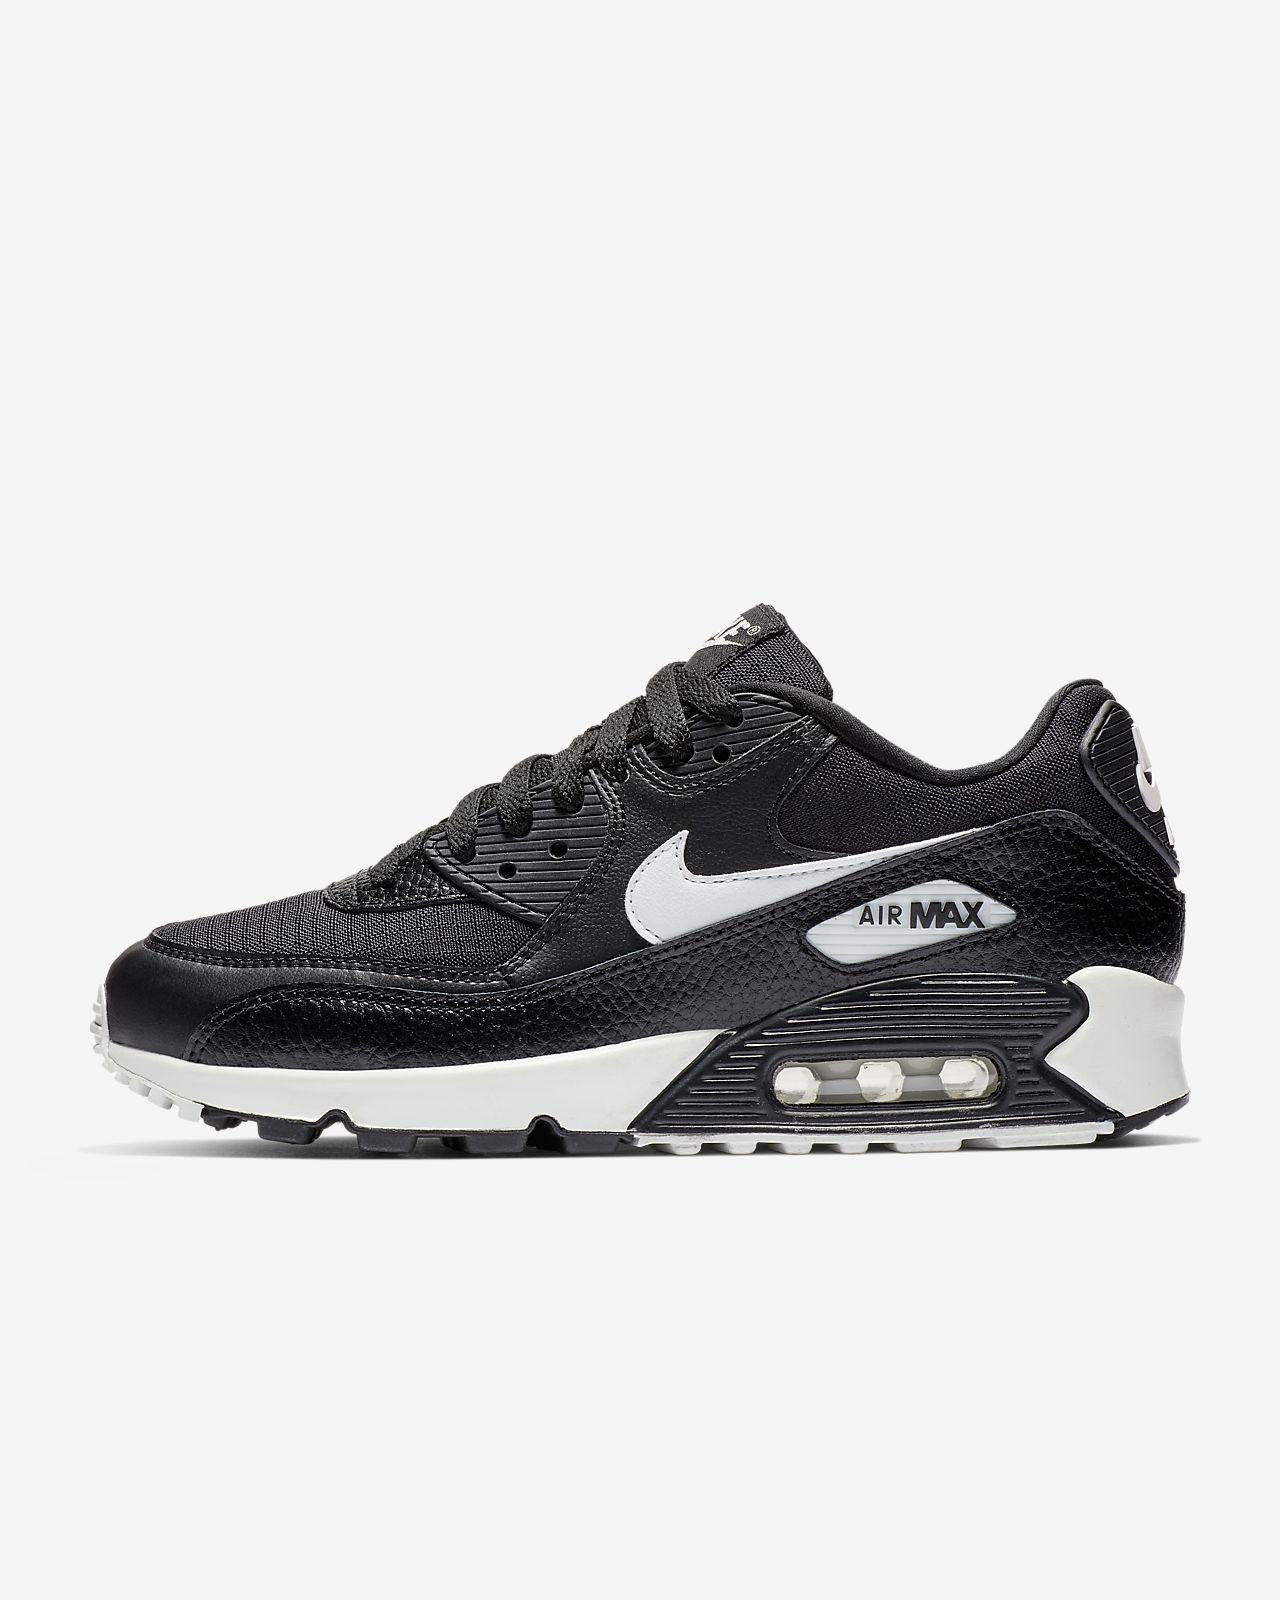 on sale e9a40 73eaa ... Nike Air Max 90 Zapatillas - Mujer